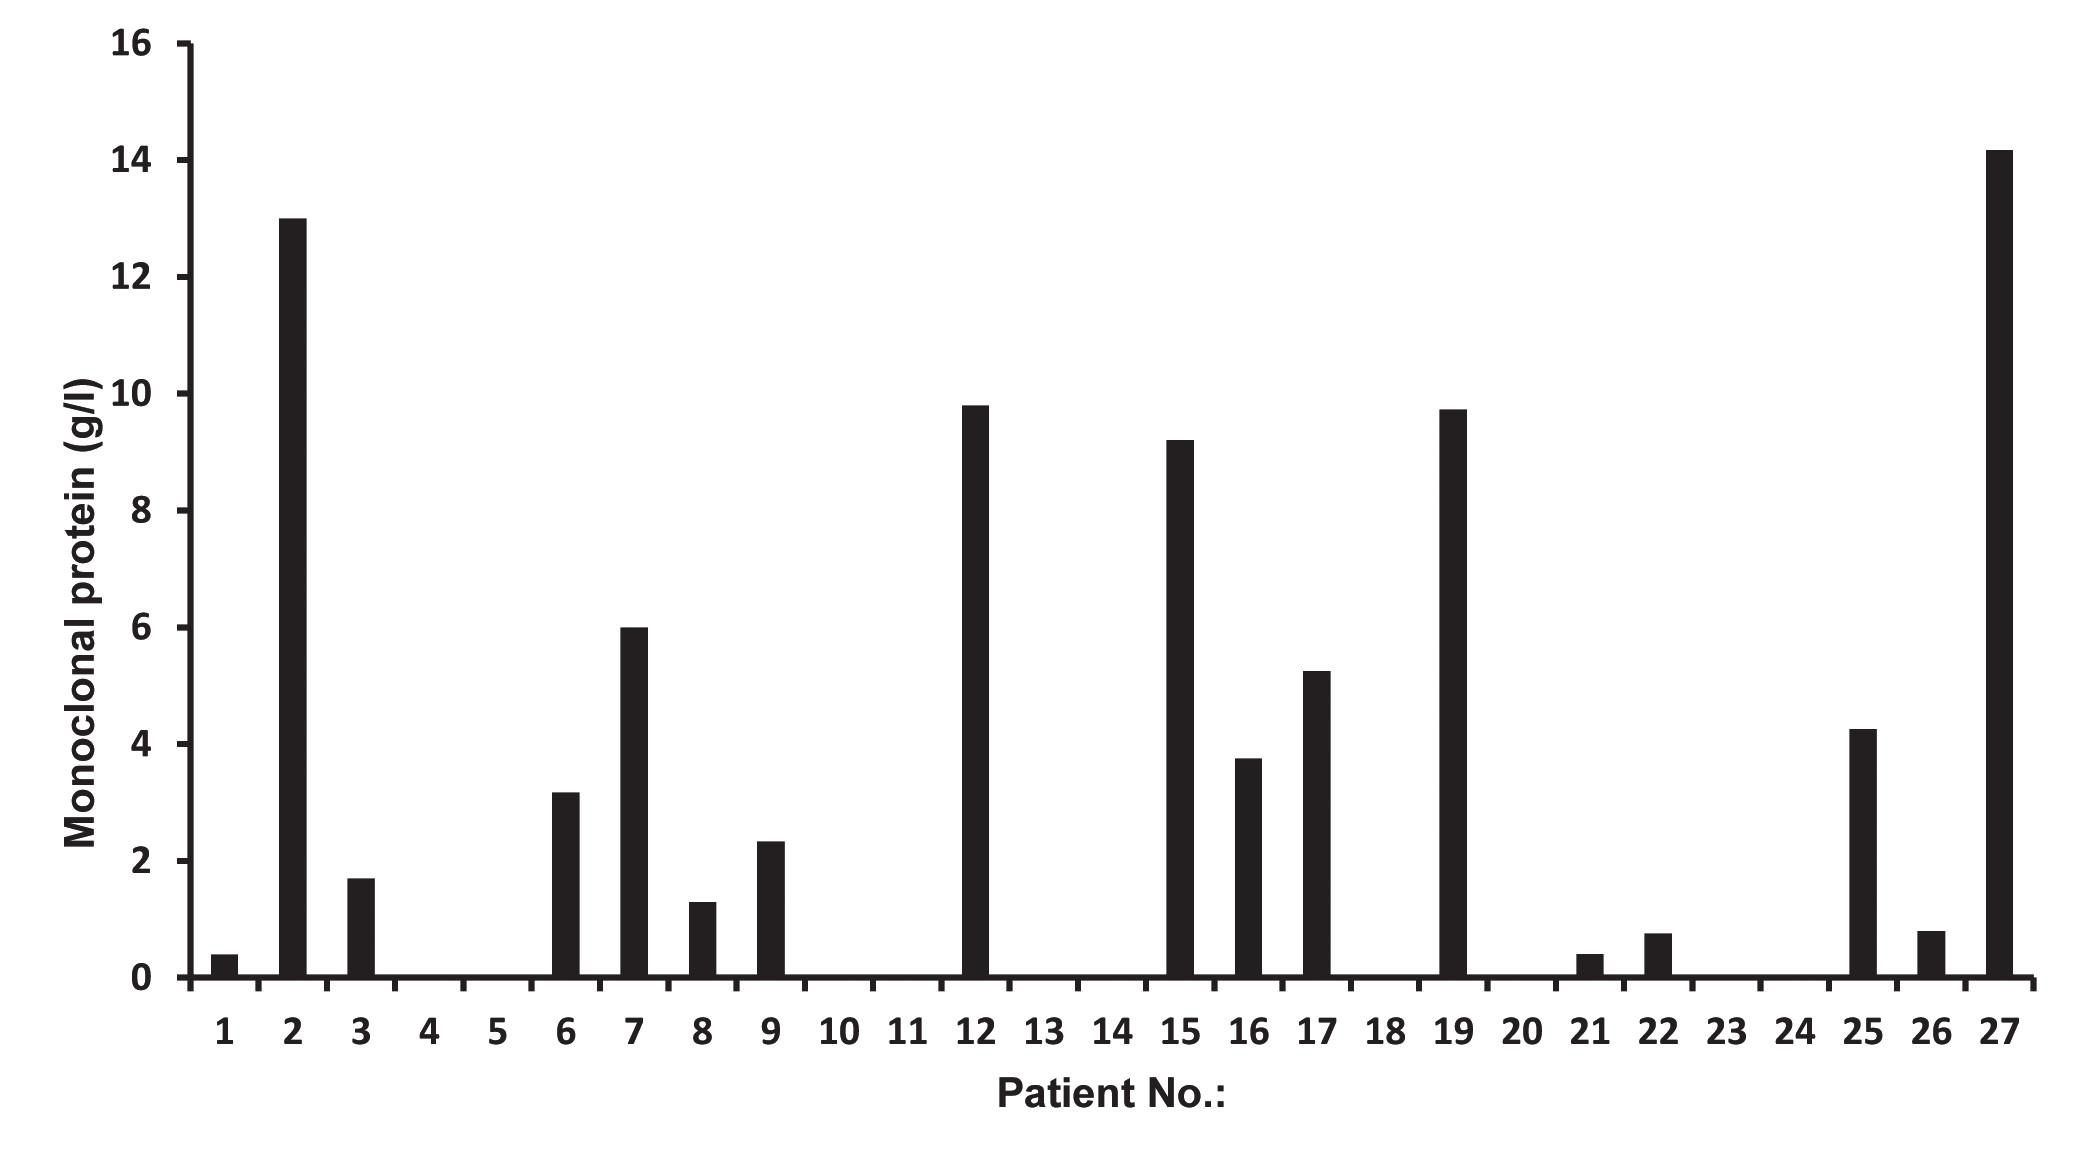 Fig. 1. Serum monoclonal immunoglobulin levels in patients with AL amyloidosis (n = 27).